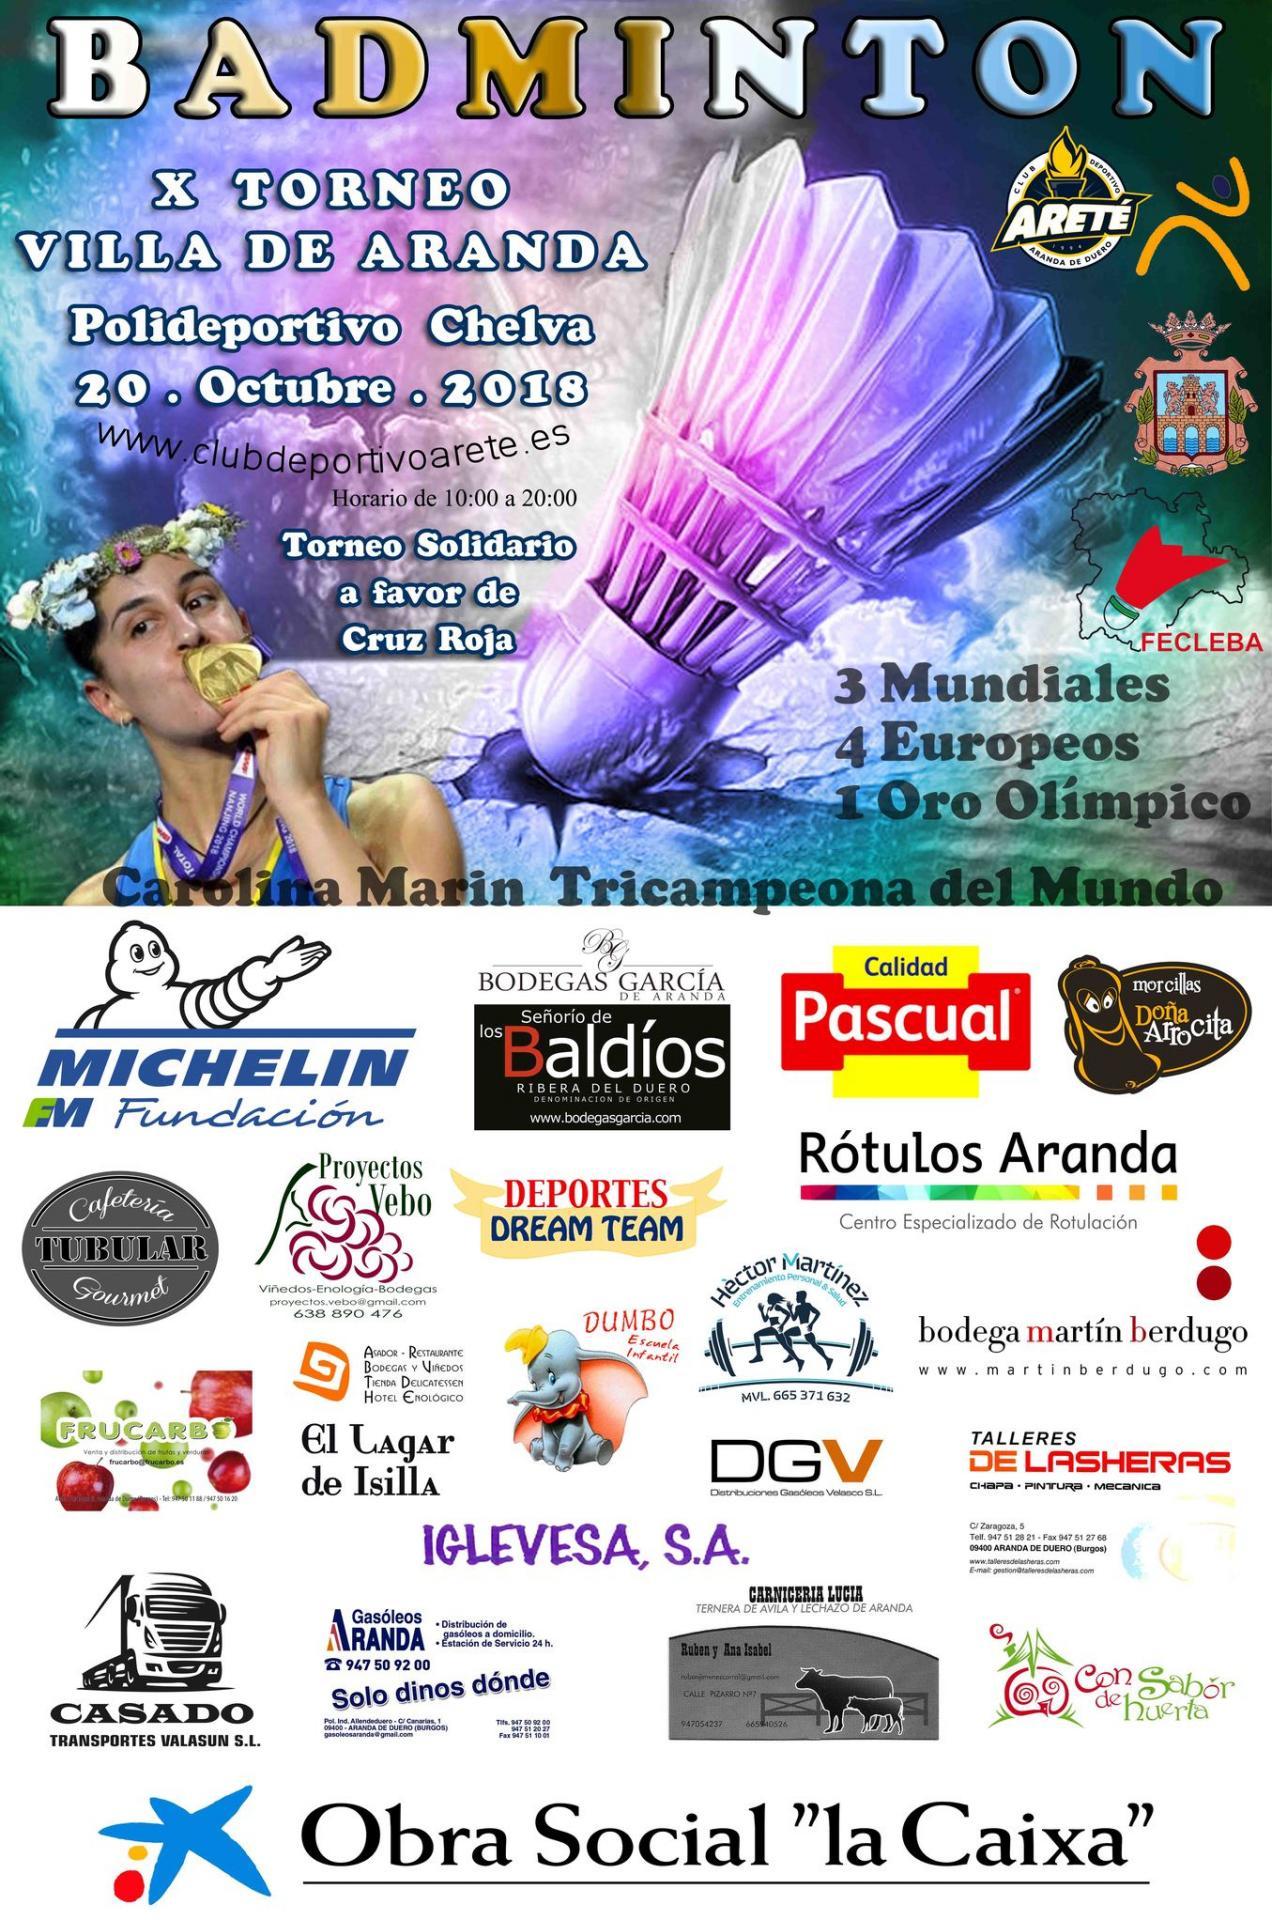 Cd arete cartel x torneo de badminton villa aranda 2018 2